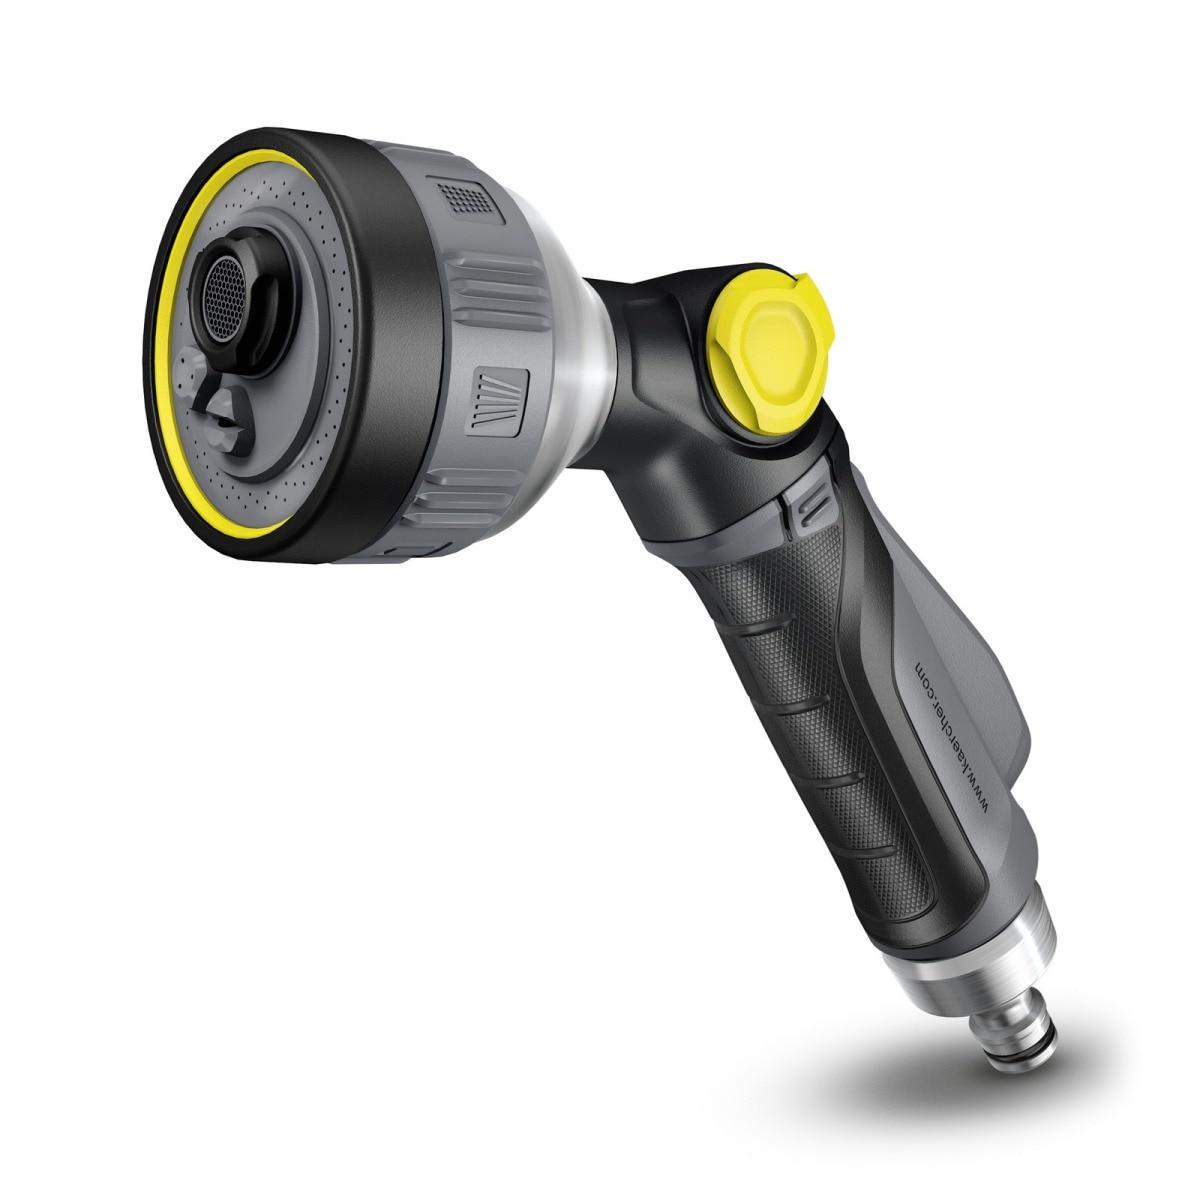 Spray gun KARCHER (2.645-271) (4-mode spray adjust water pressure, rotary knob, di